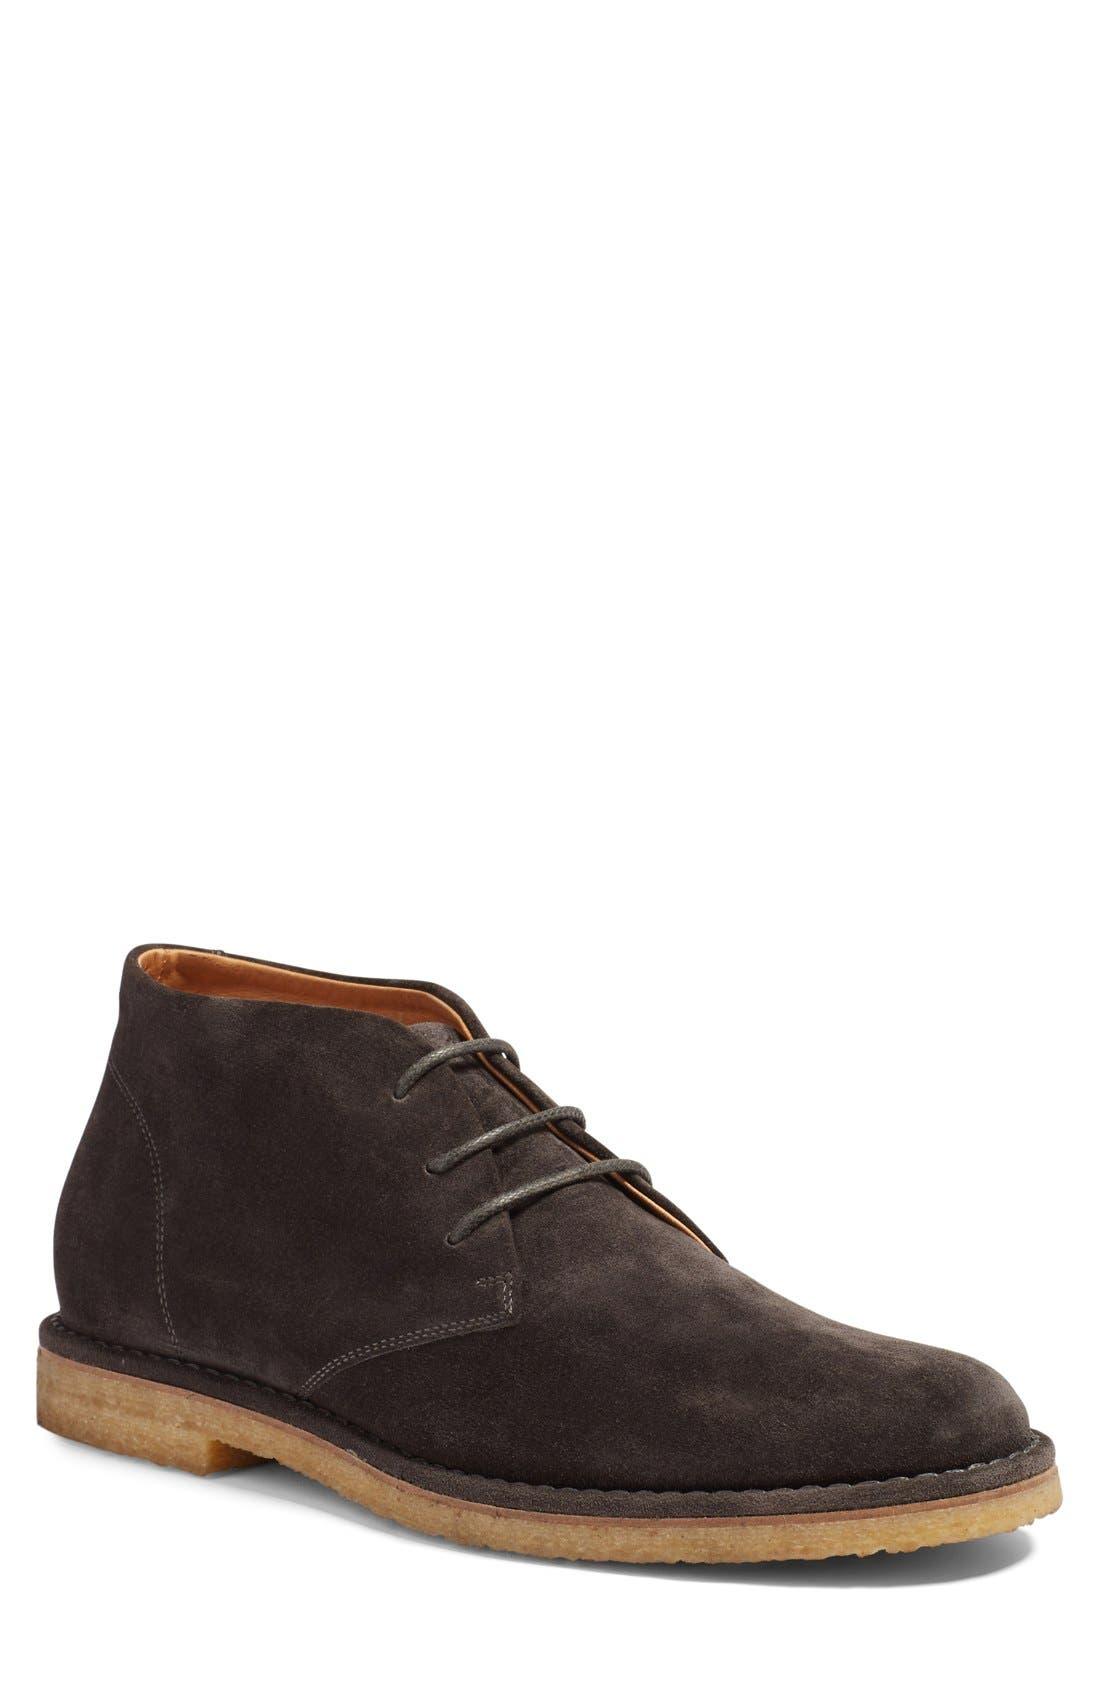 'Scott' Chukka Boot,                         Main,                         color, 021